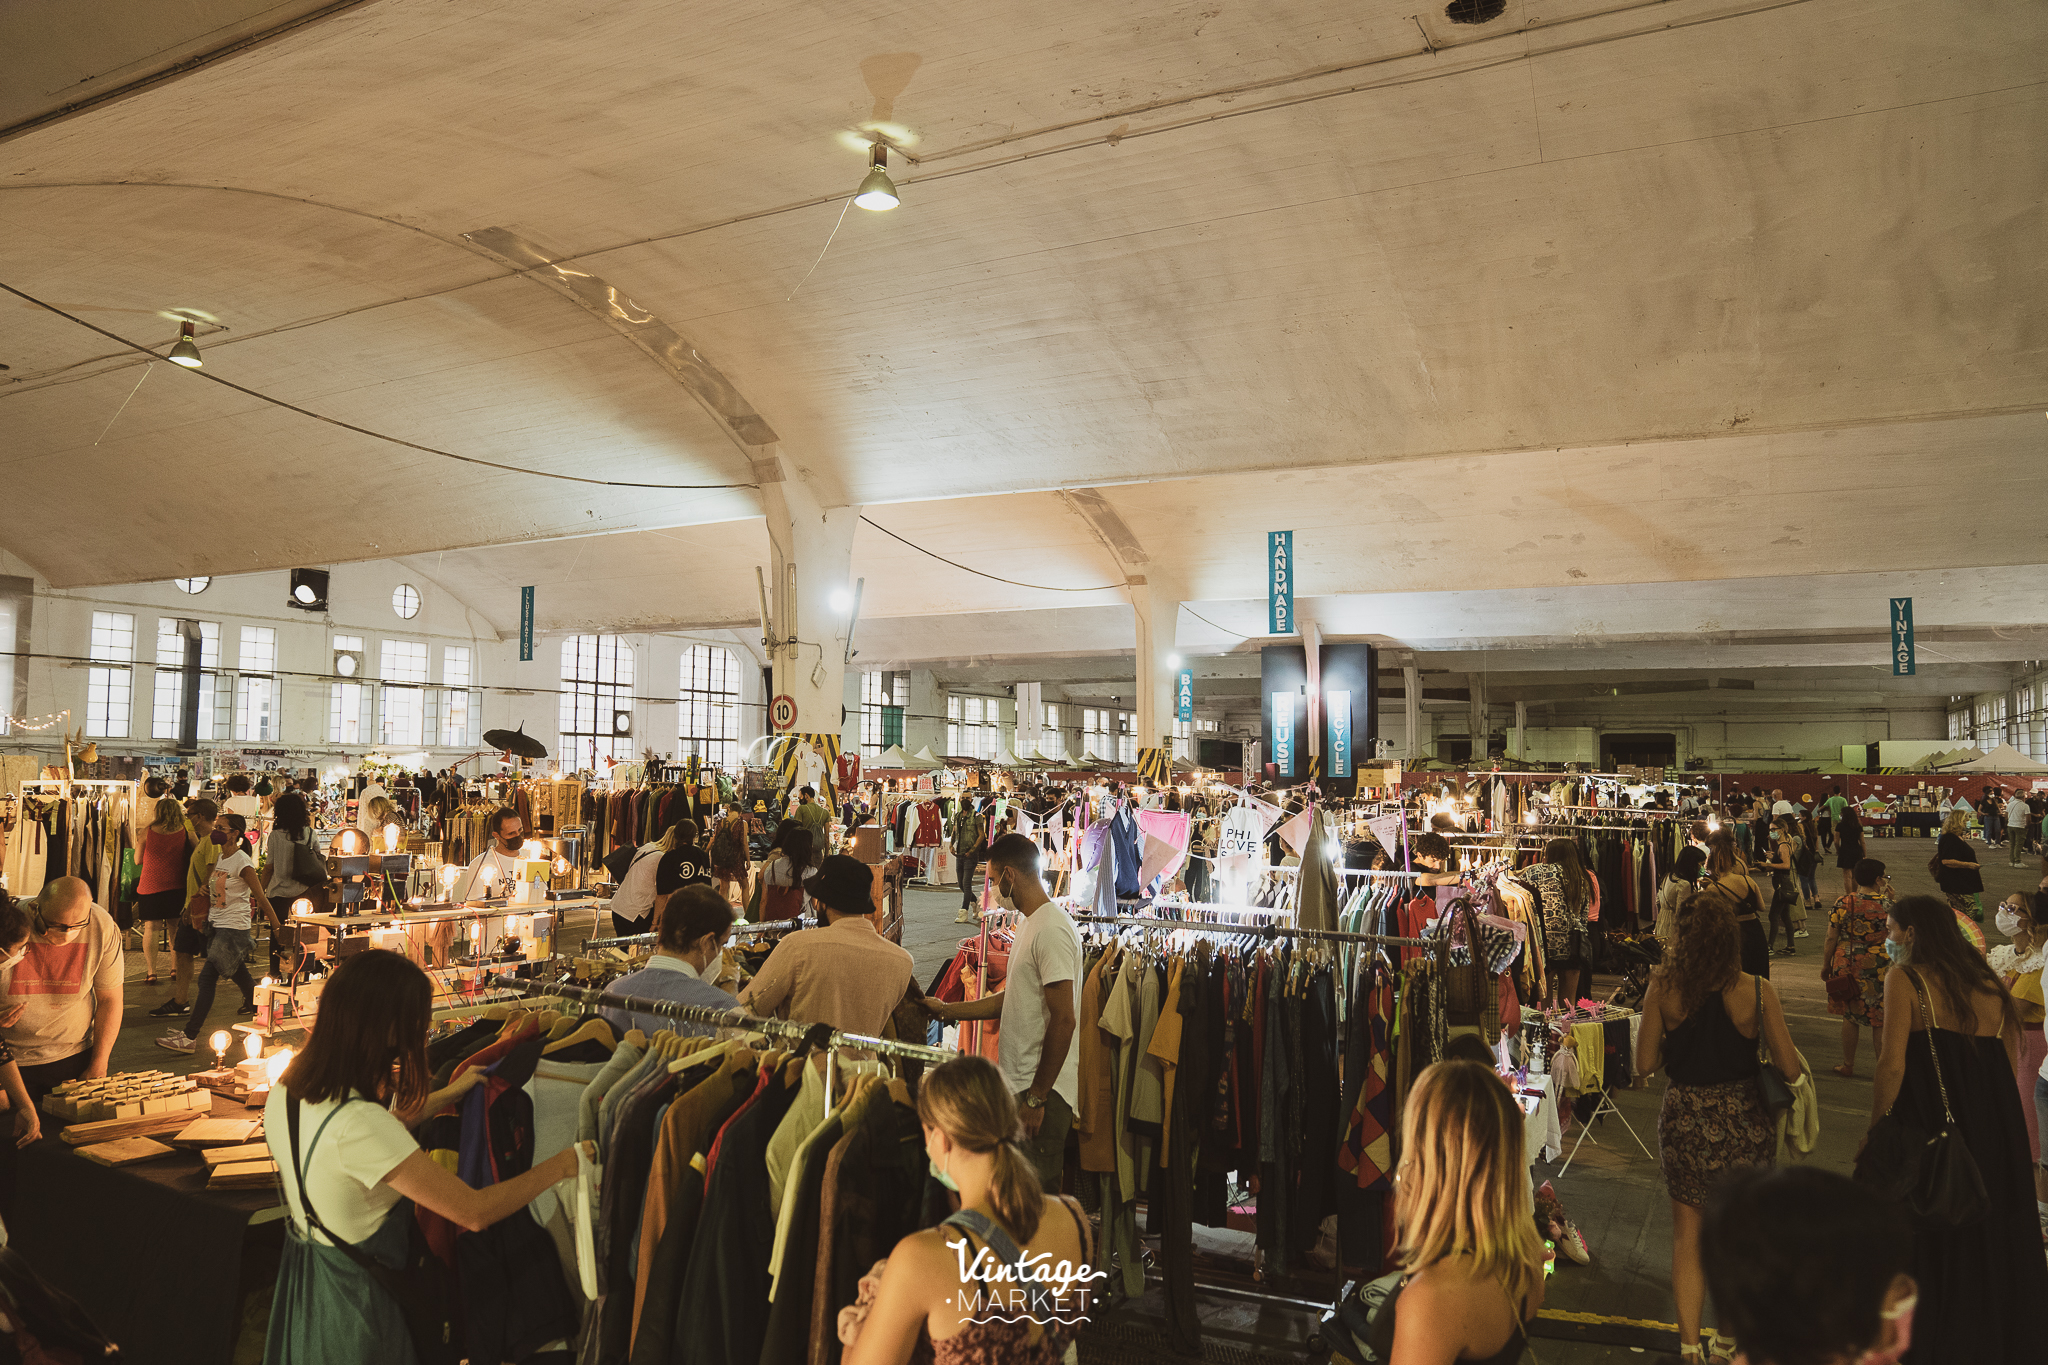 vintage market 23 e 24 ottobre